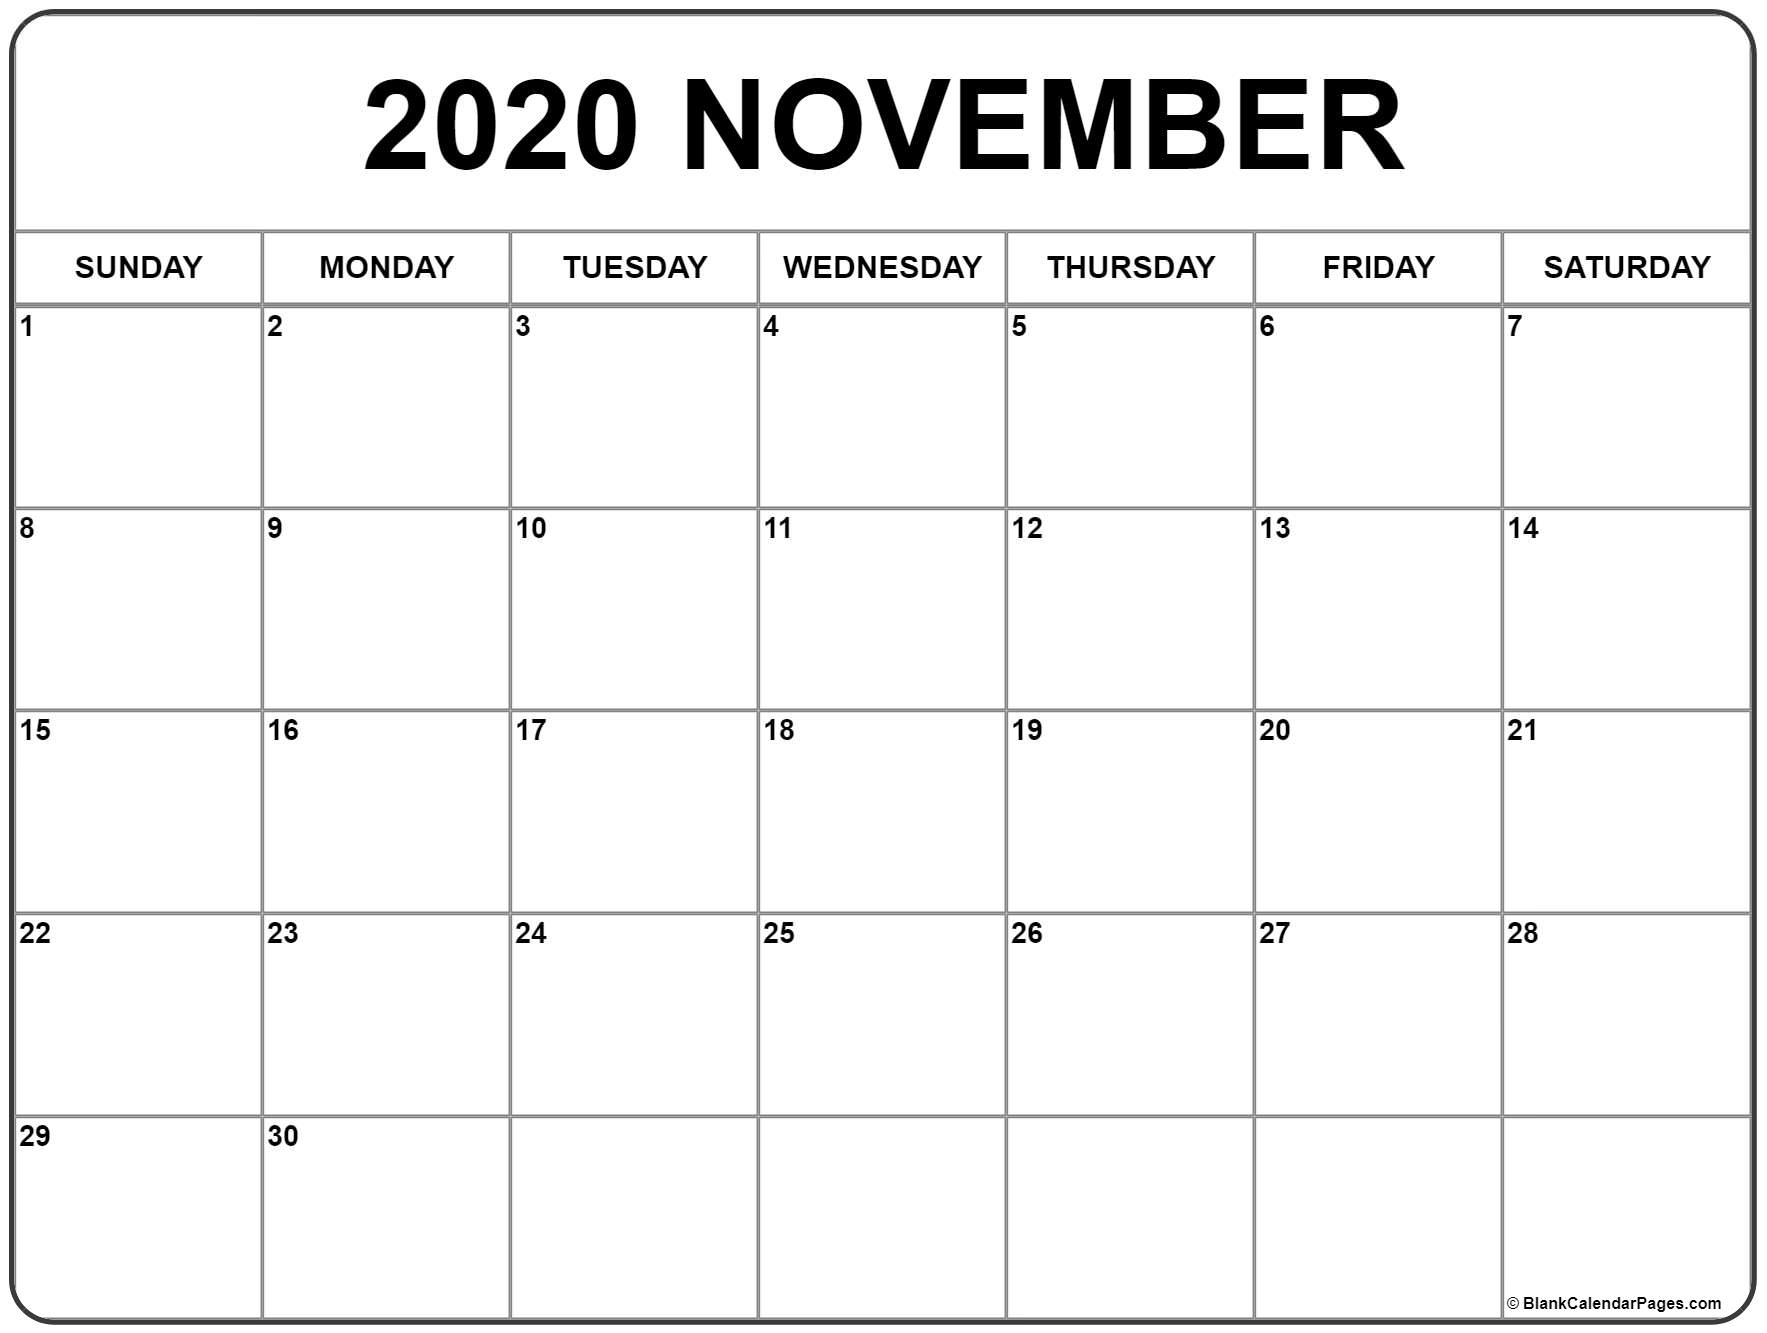 November 2020 Calendar | Free Printable Monthly Calendars in 2020 Calander To Write On